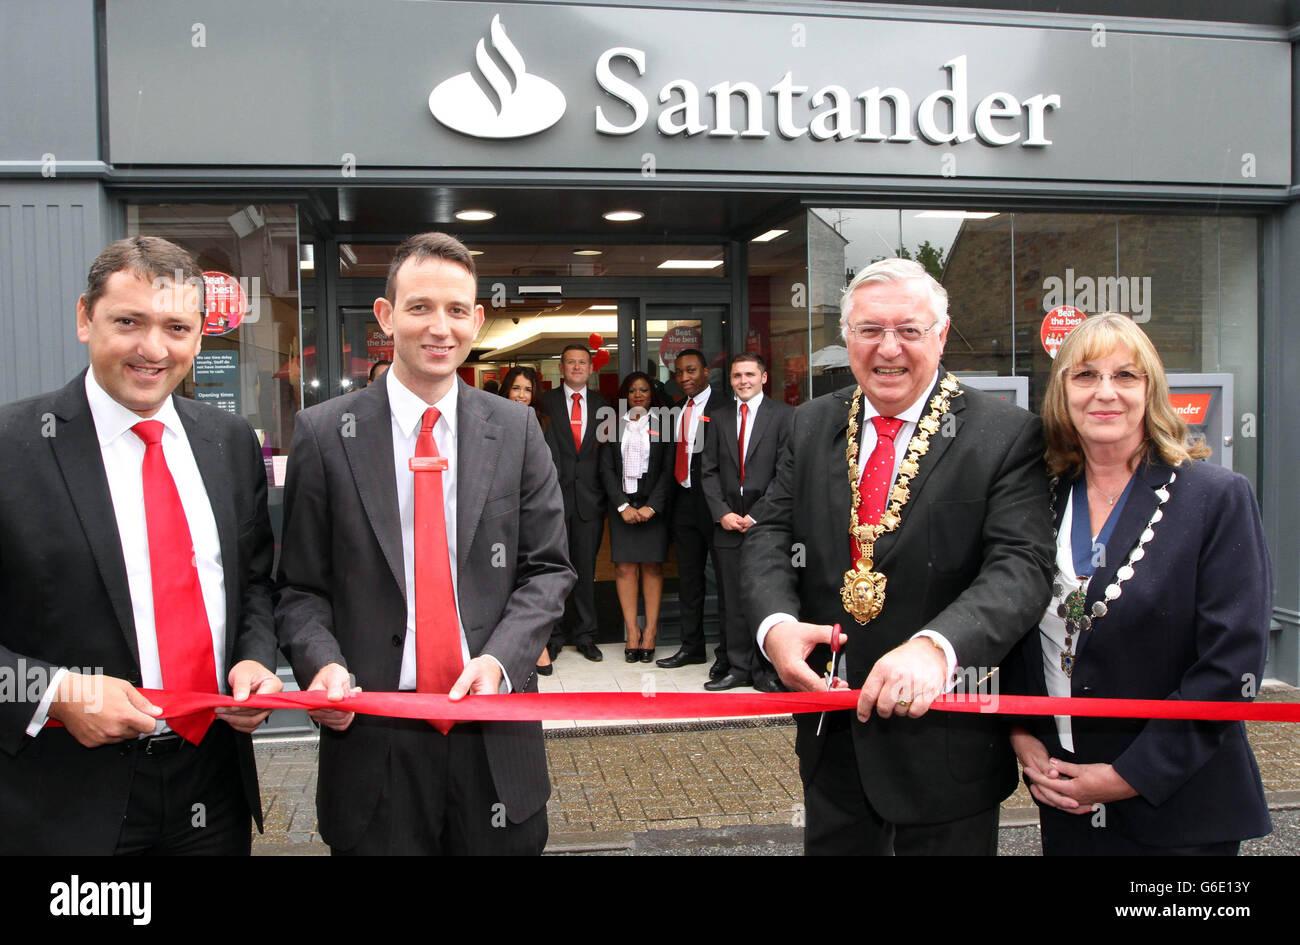 Santander branch opening in Saffron Walden - Stock Image